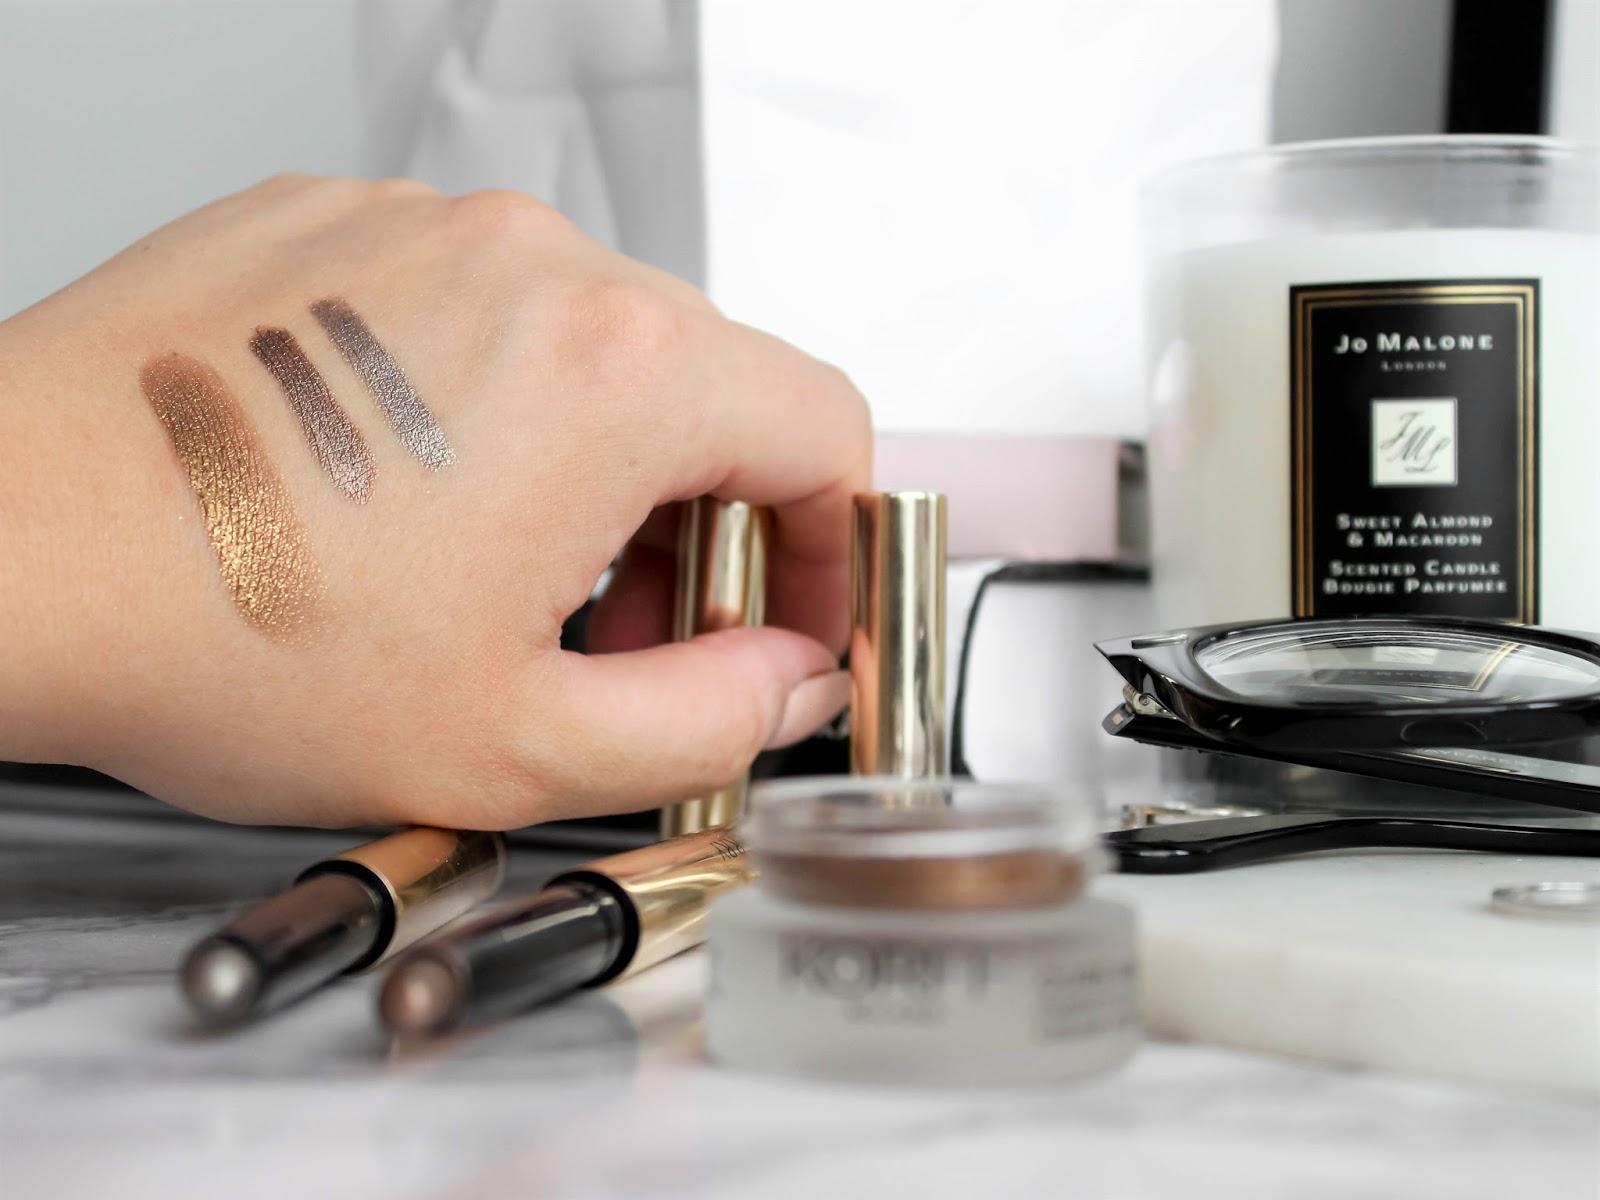 korff makeup by terry stiny v tuzce